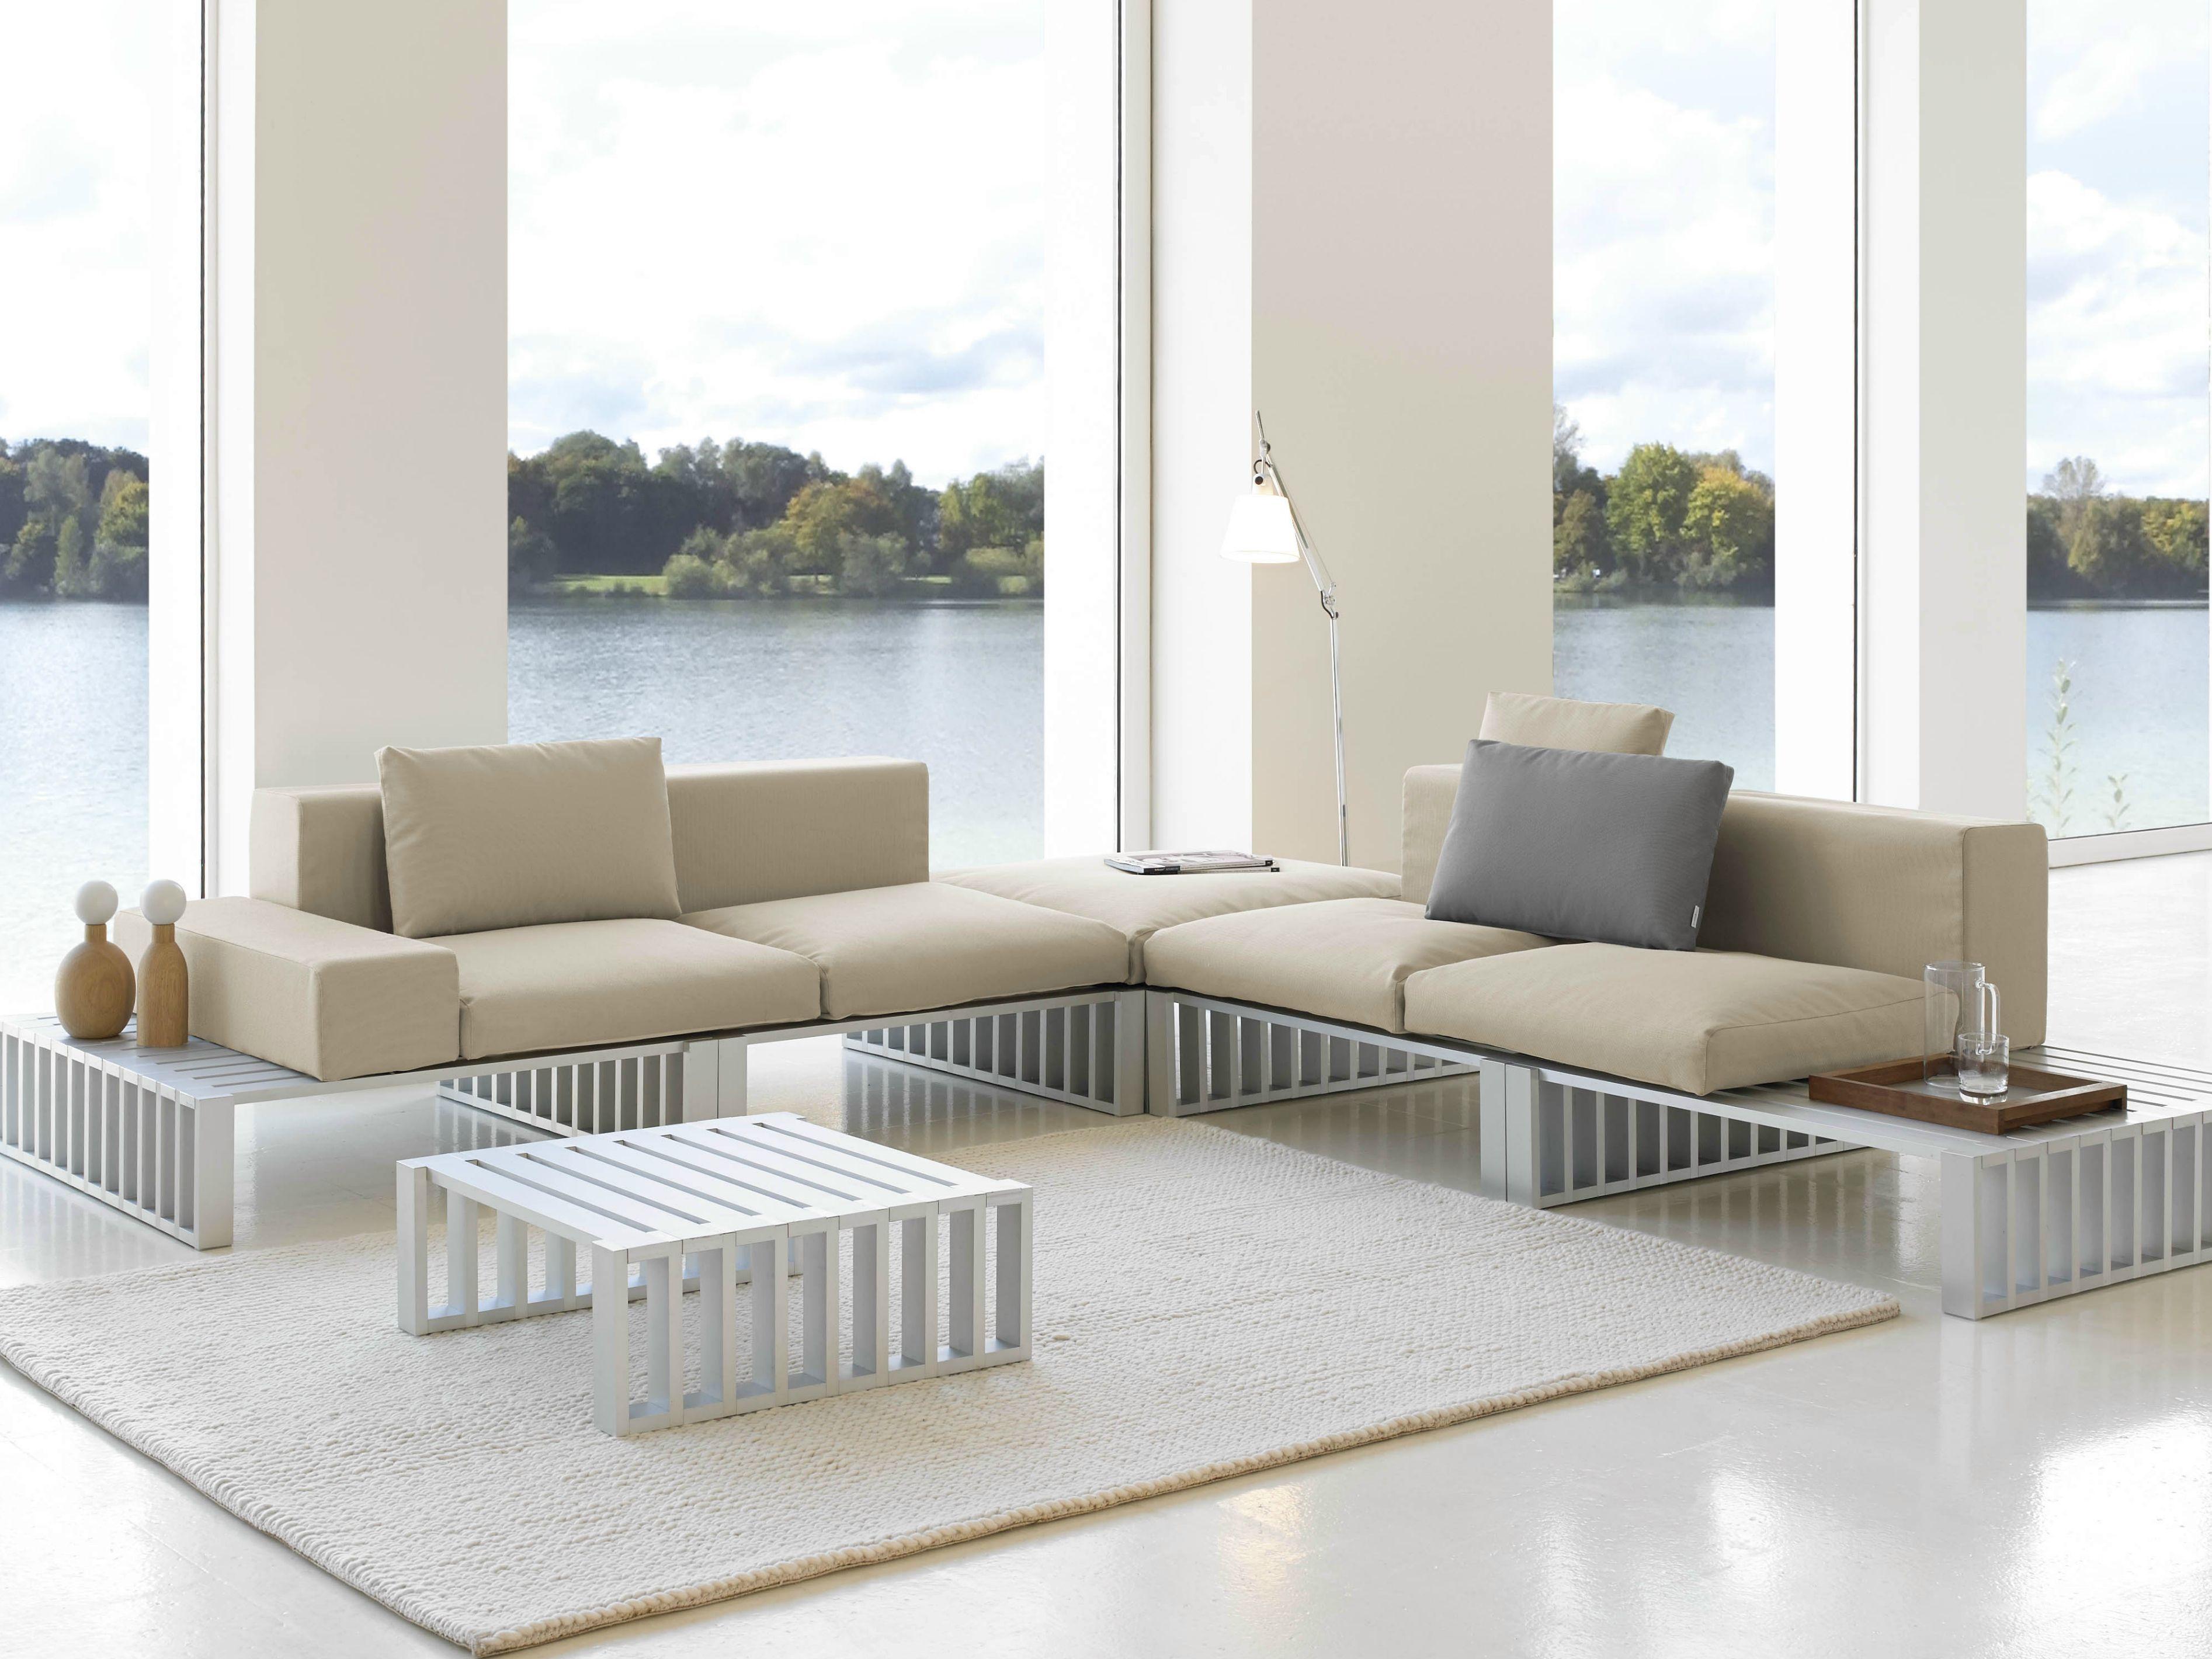 Docks sof composable by gandia blasco dise o romero vallejo - Gandia blasco precios ...